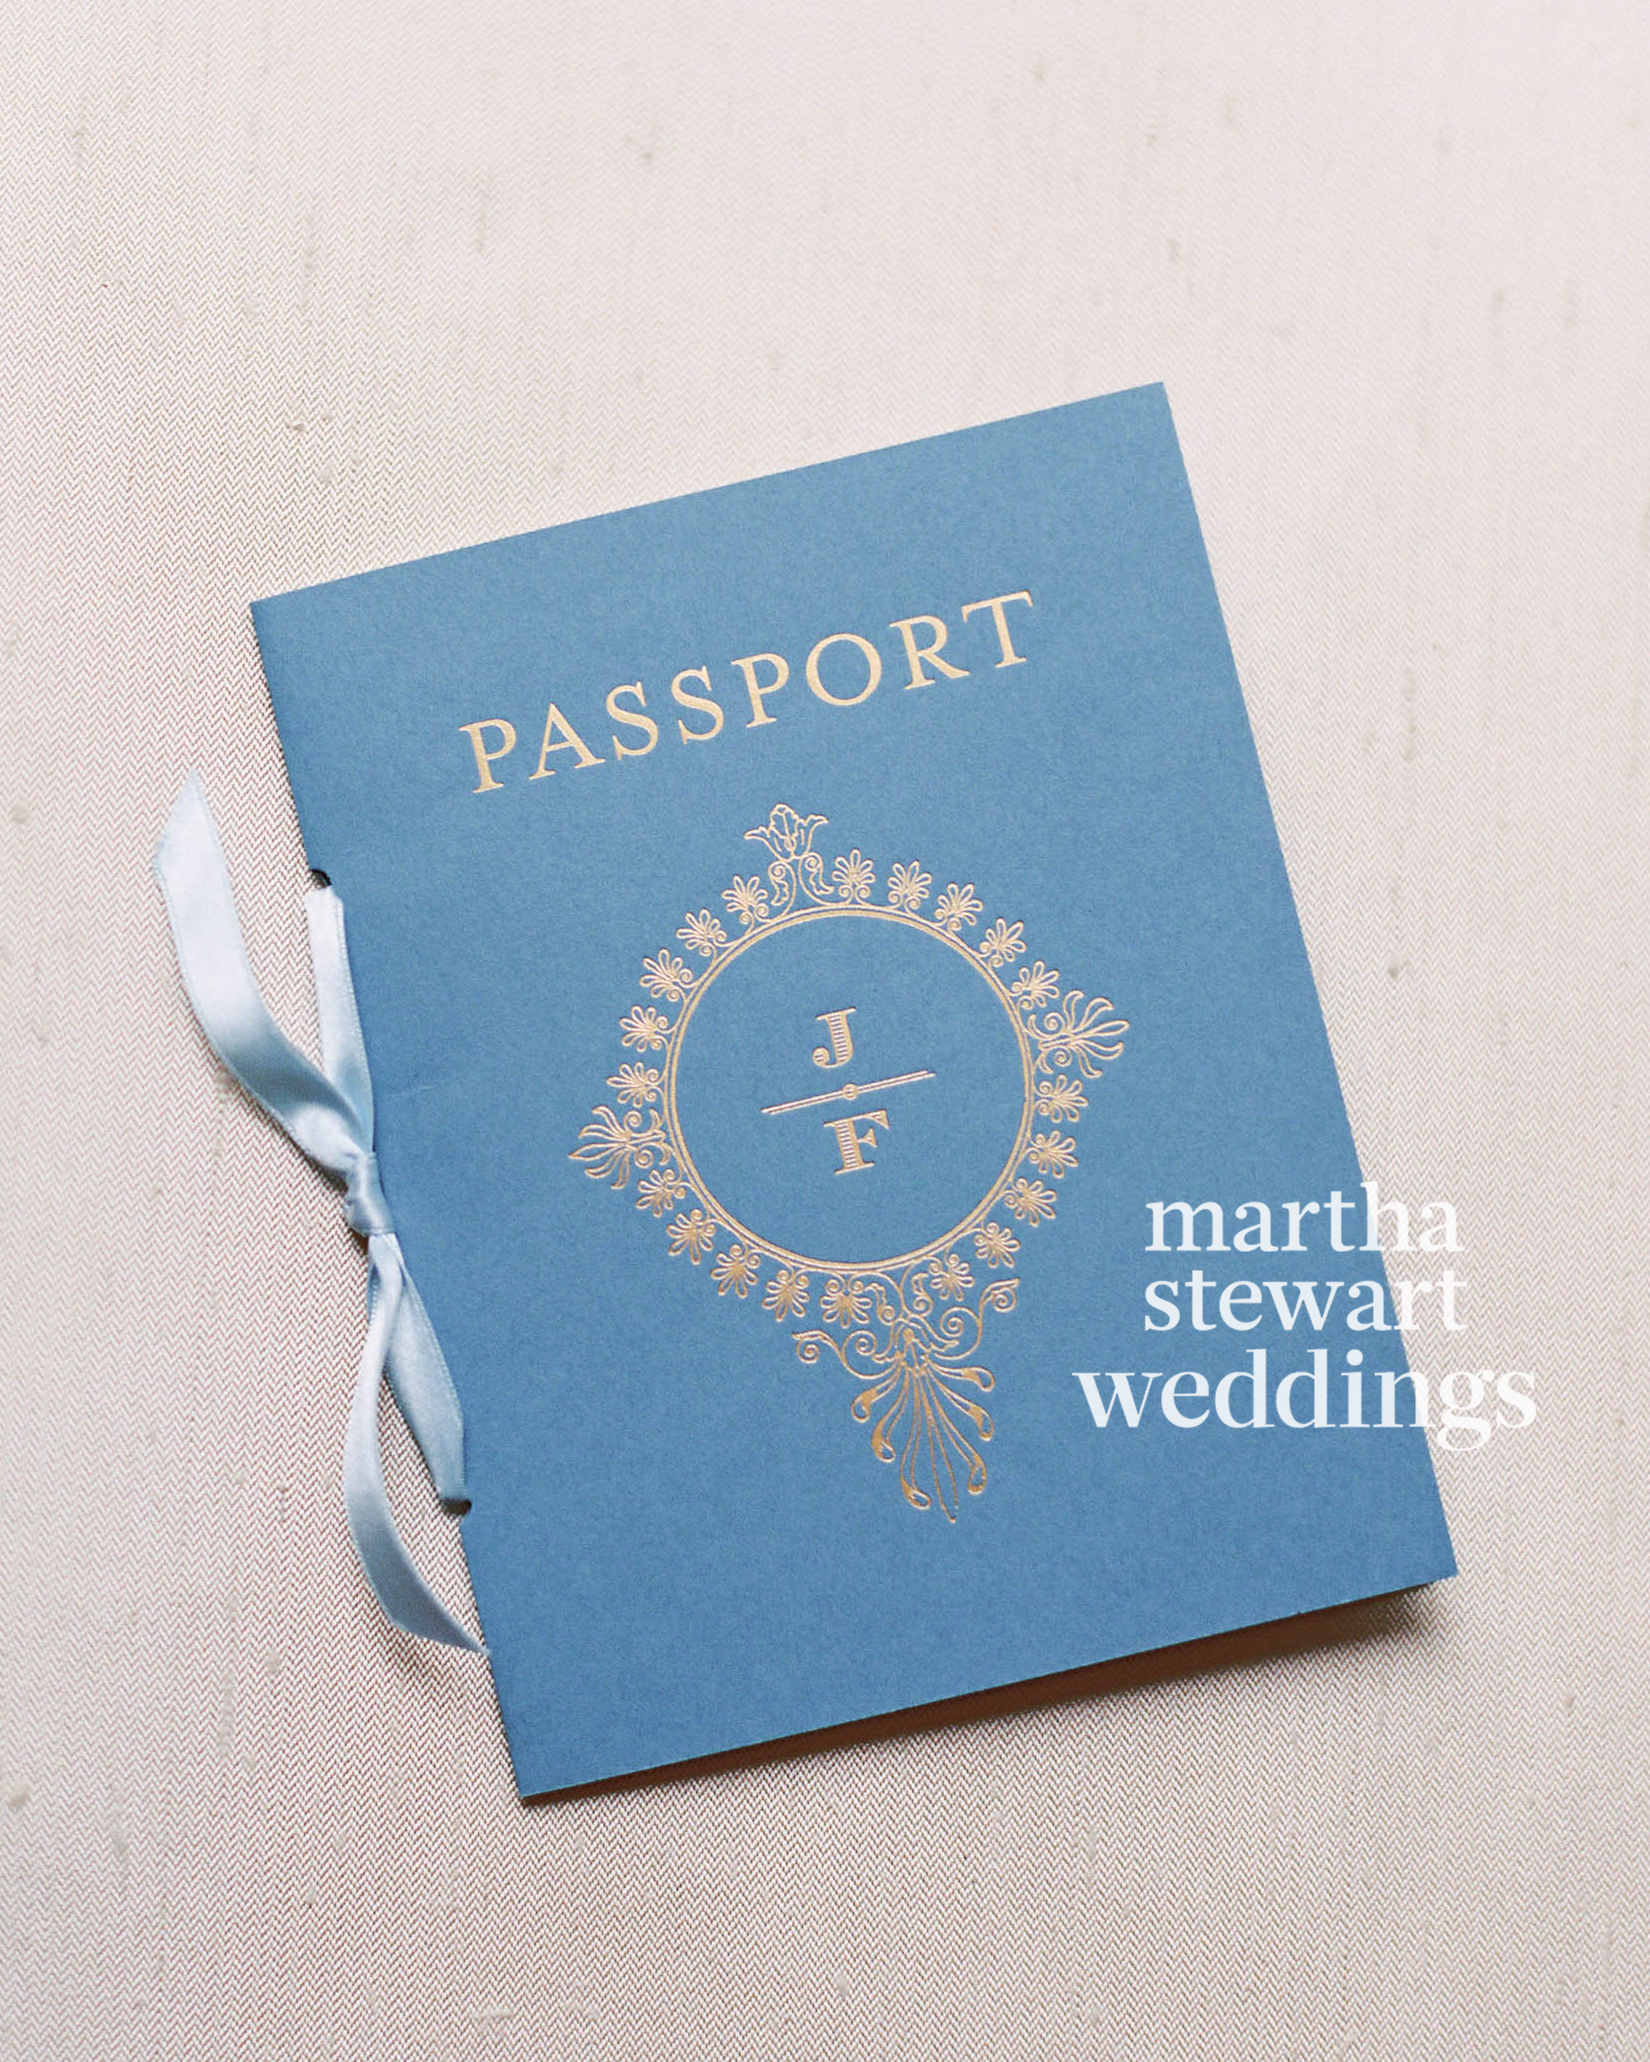 jenny-freddie-wedding-france-065-d112242-watermarked-1215.jpg